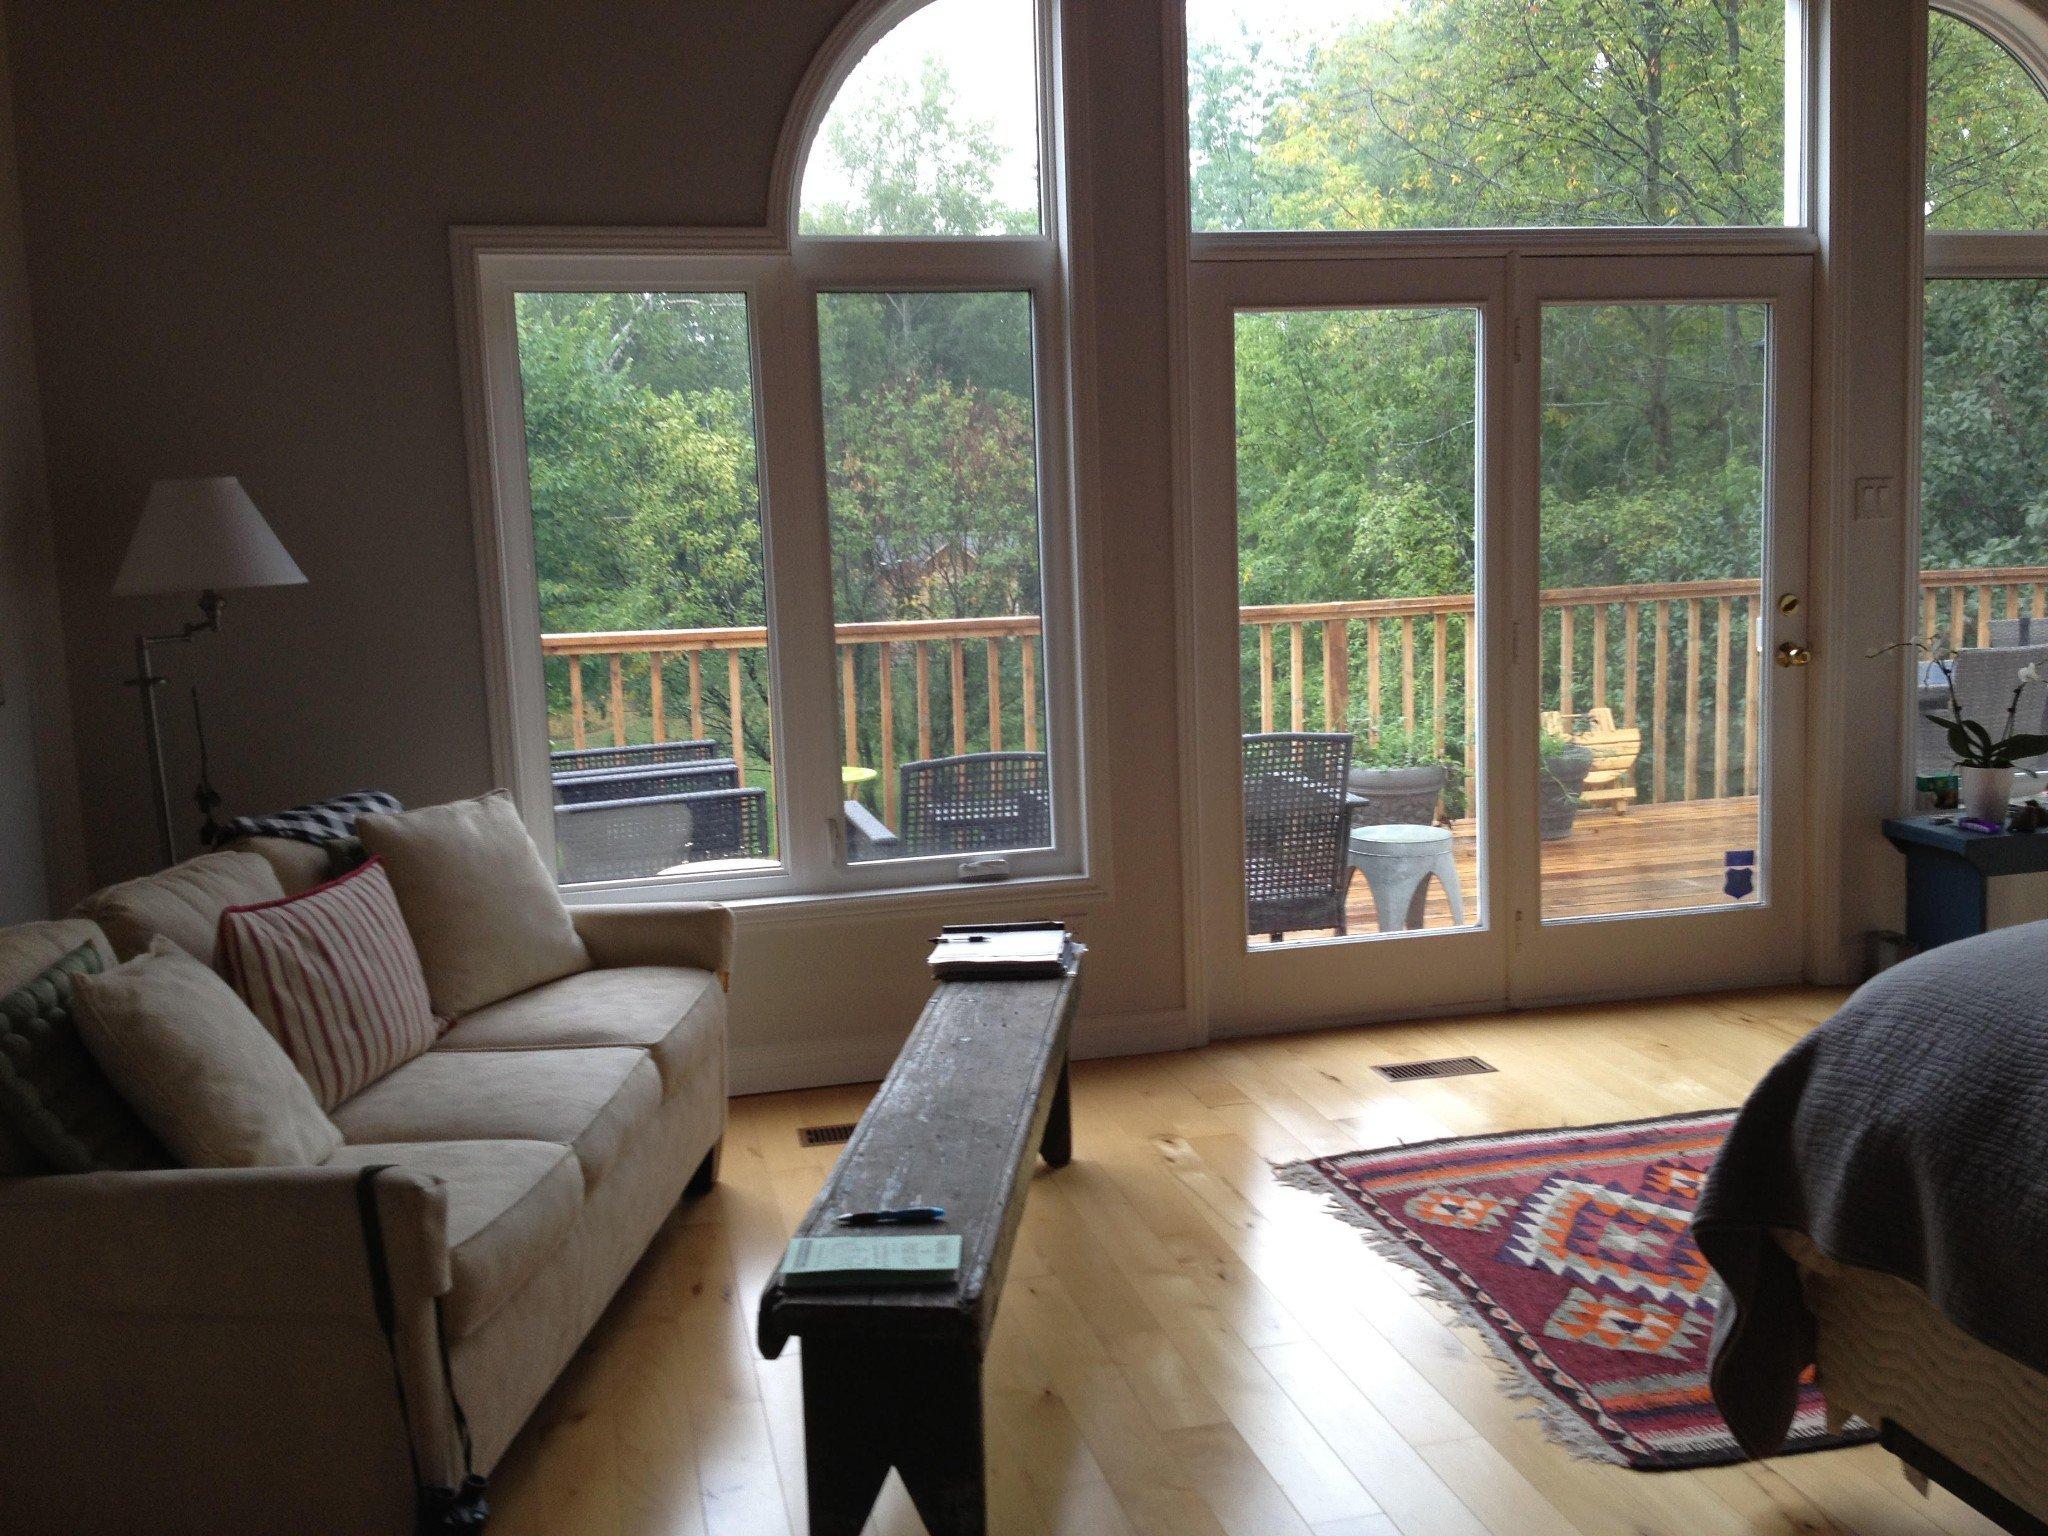 Photo 18: Photos: 430 North Street: Beaverton Freehold for sale (Brock)  : MLS®# N4030755